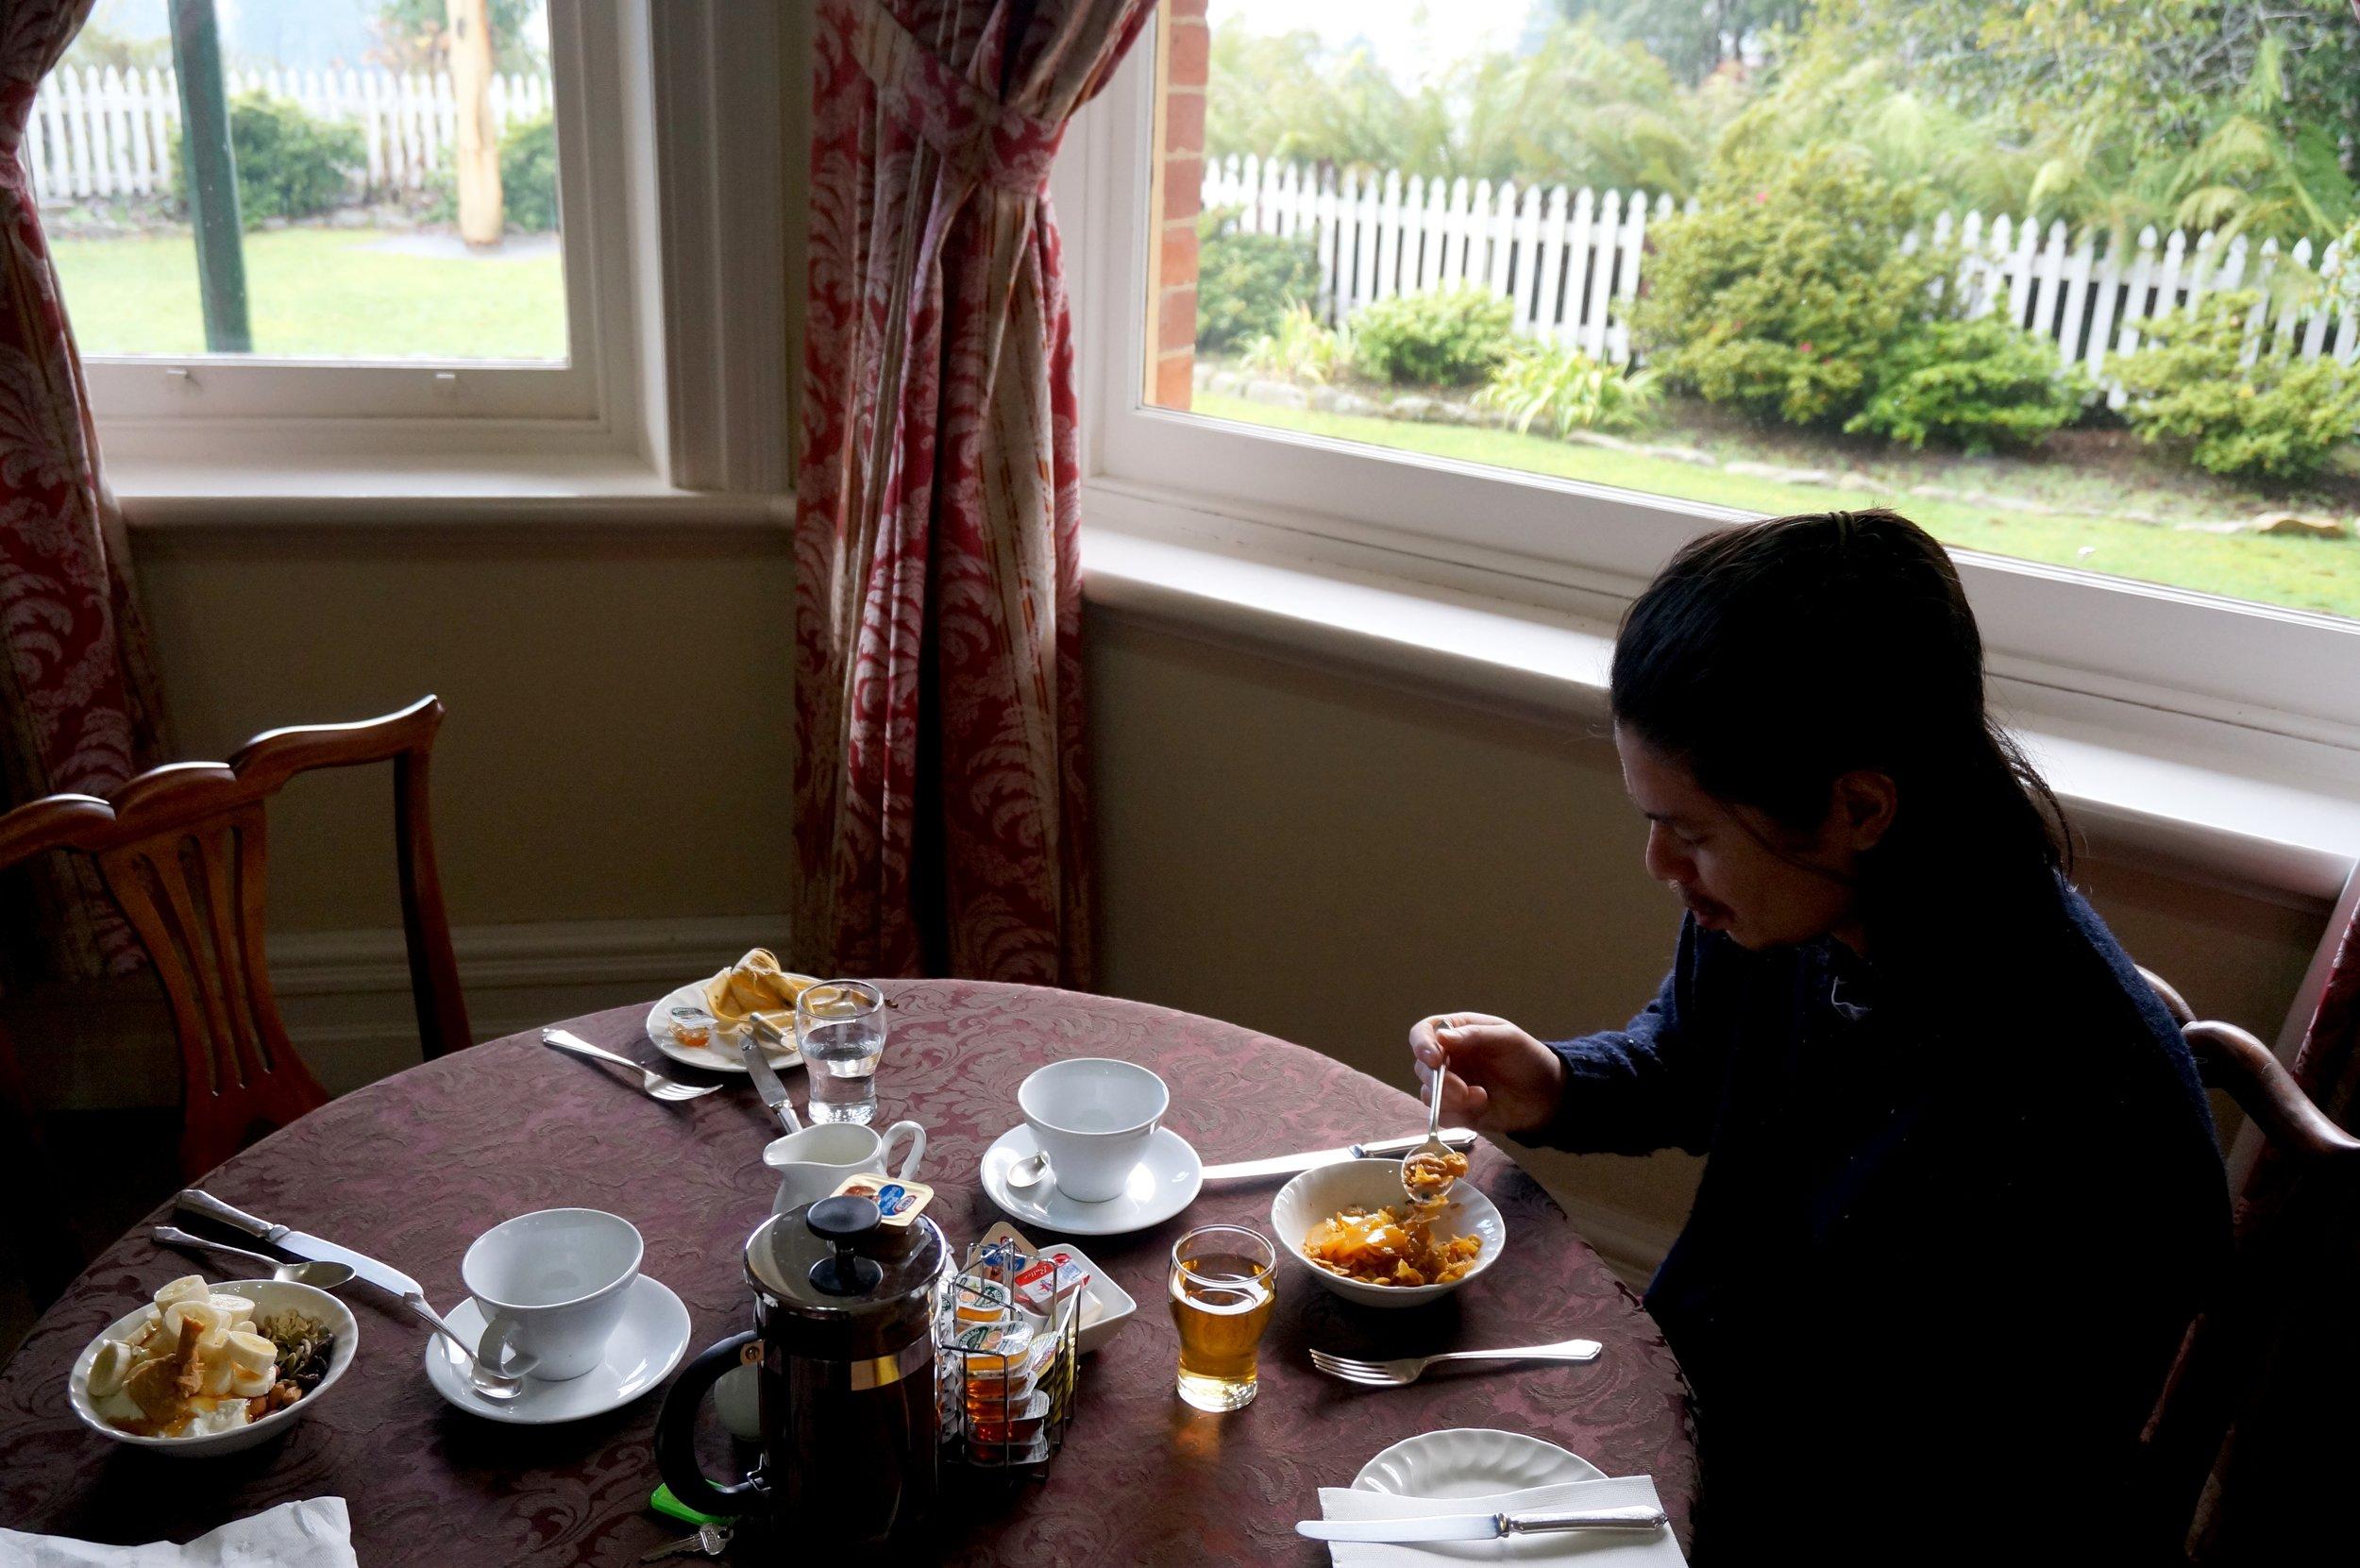 Penghana-Bed-Breakfast-breakfast-room-Heidi-Sze-Apples-Under-My-Bed.jpg